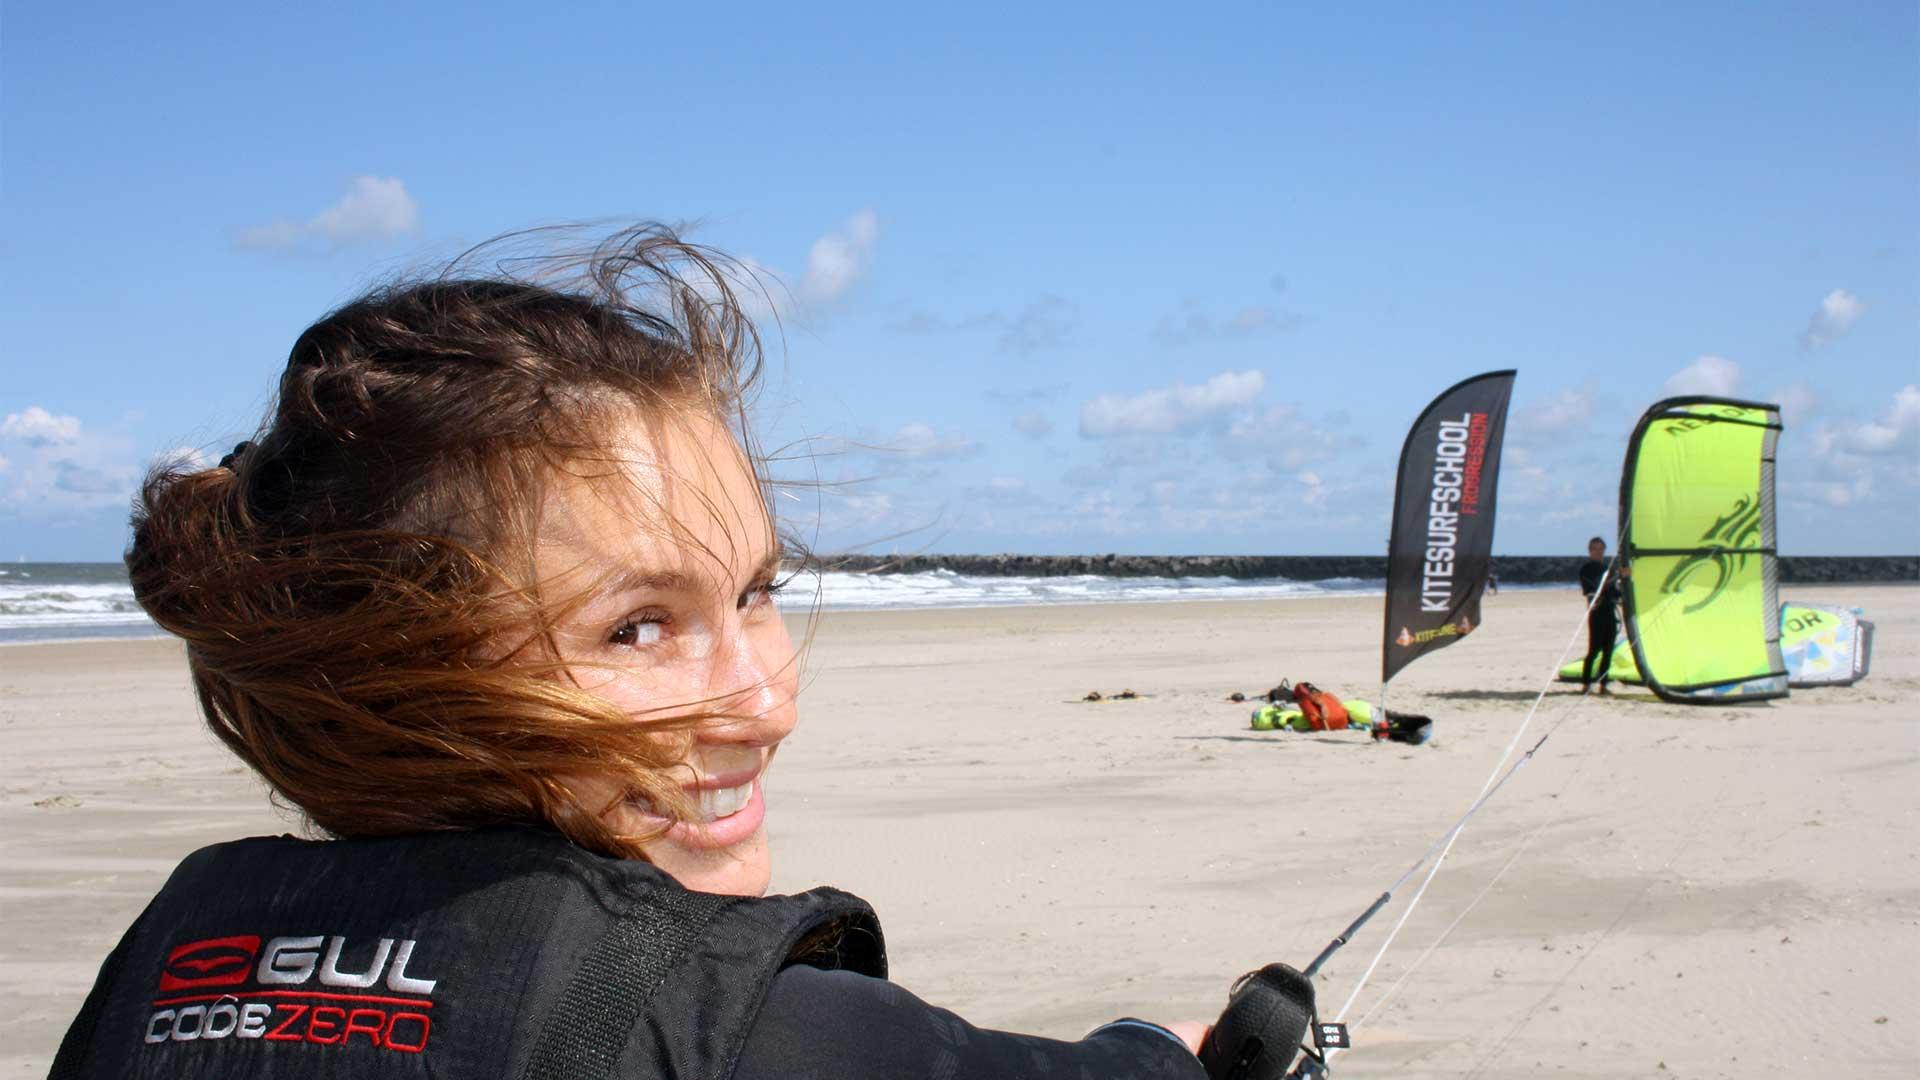 cursus kitesurfen